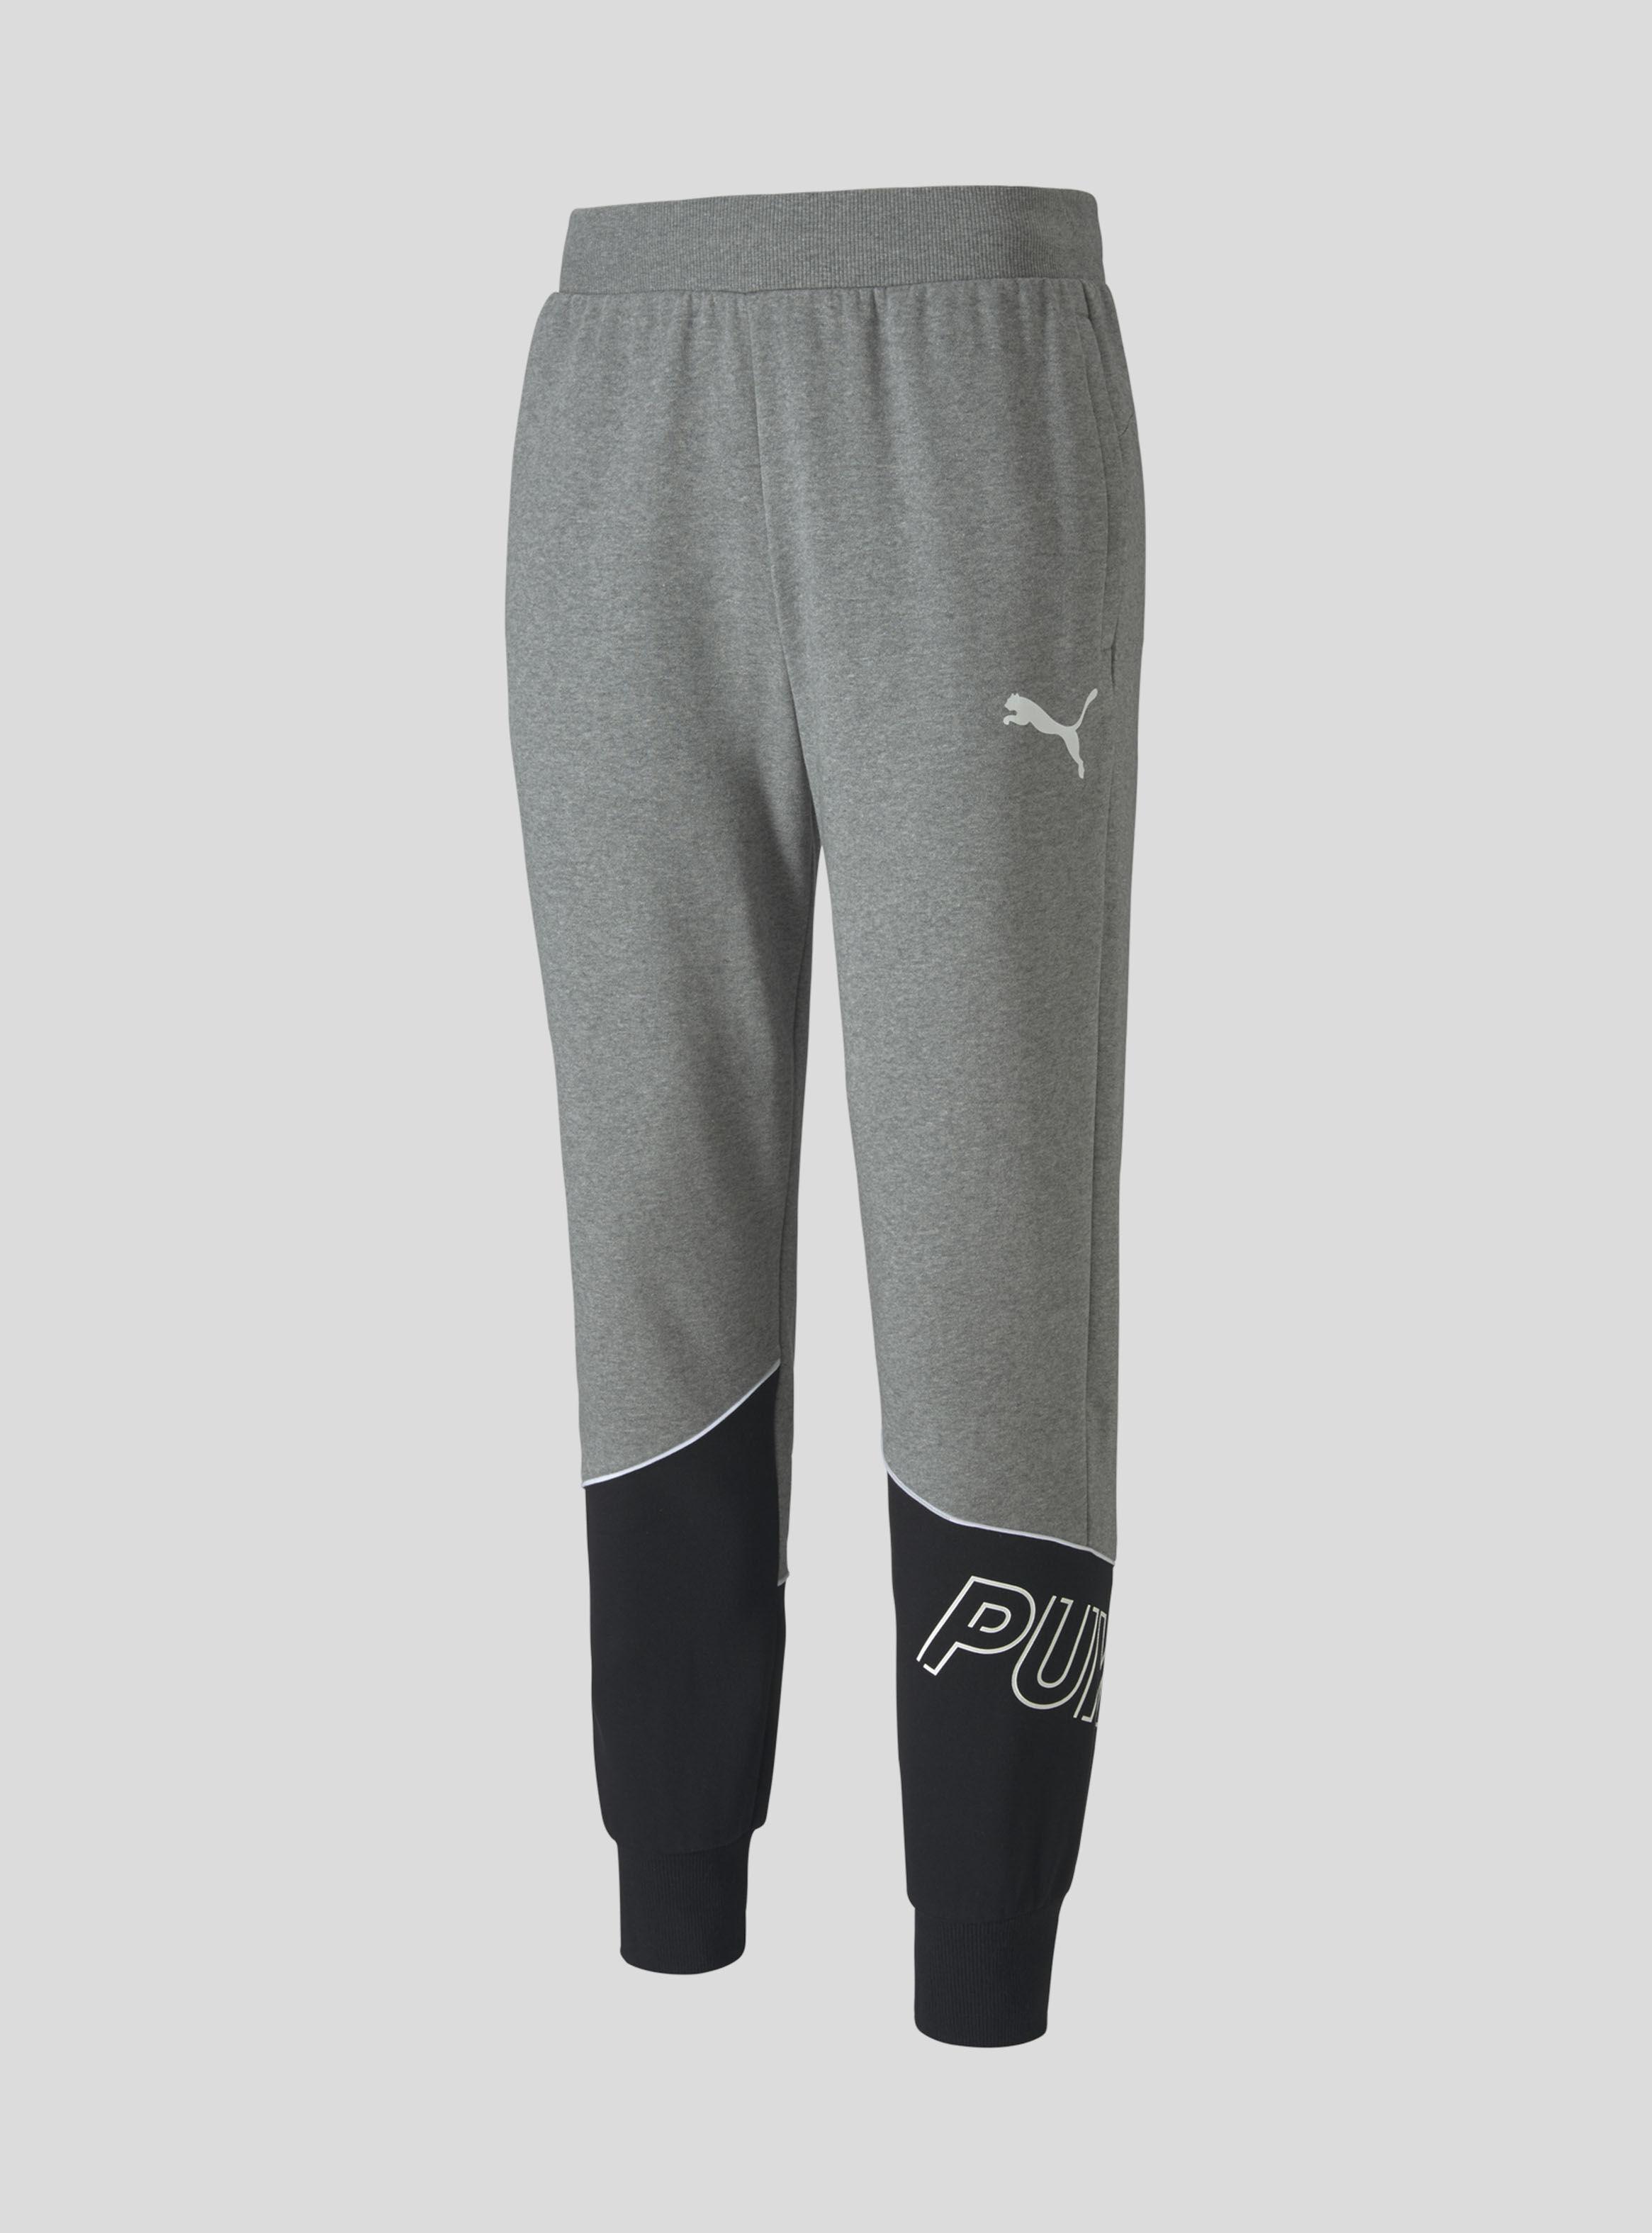 Pantalón Puma Modern Sport Hombre Gris